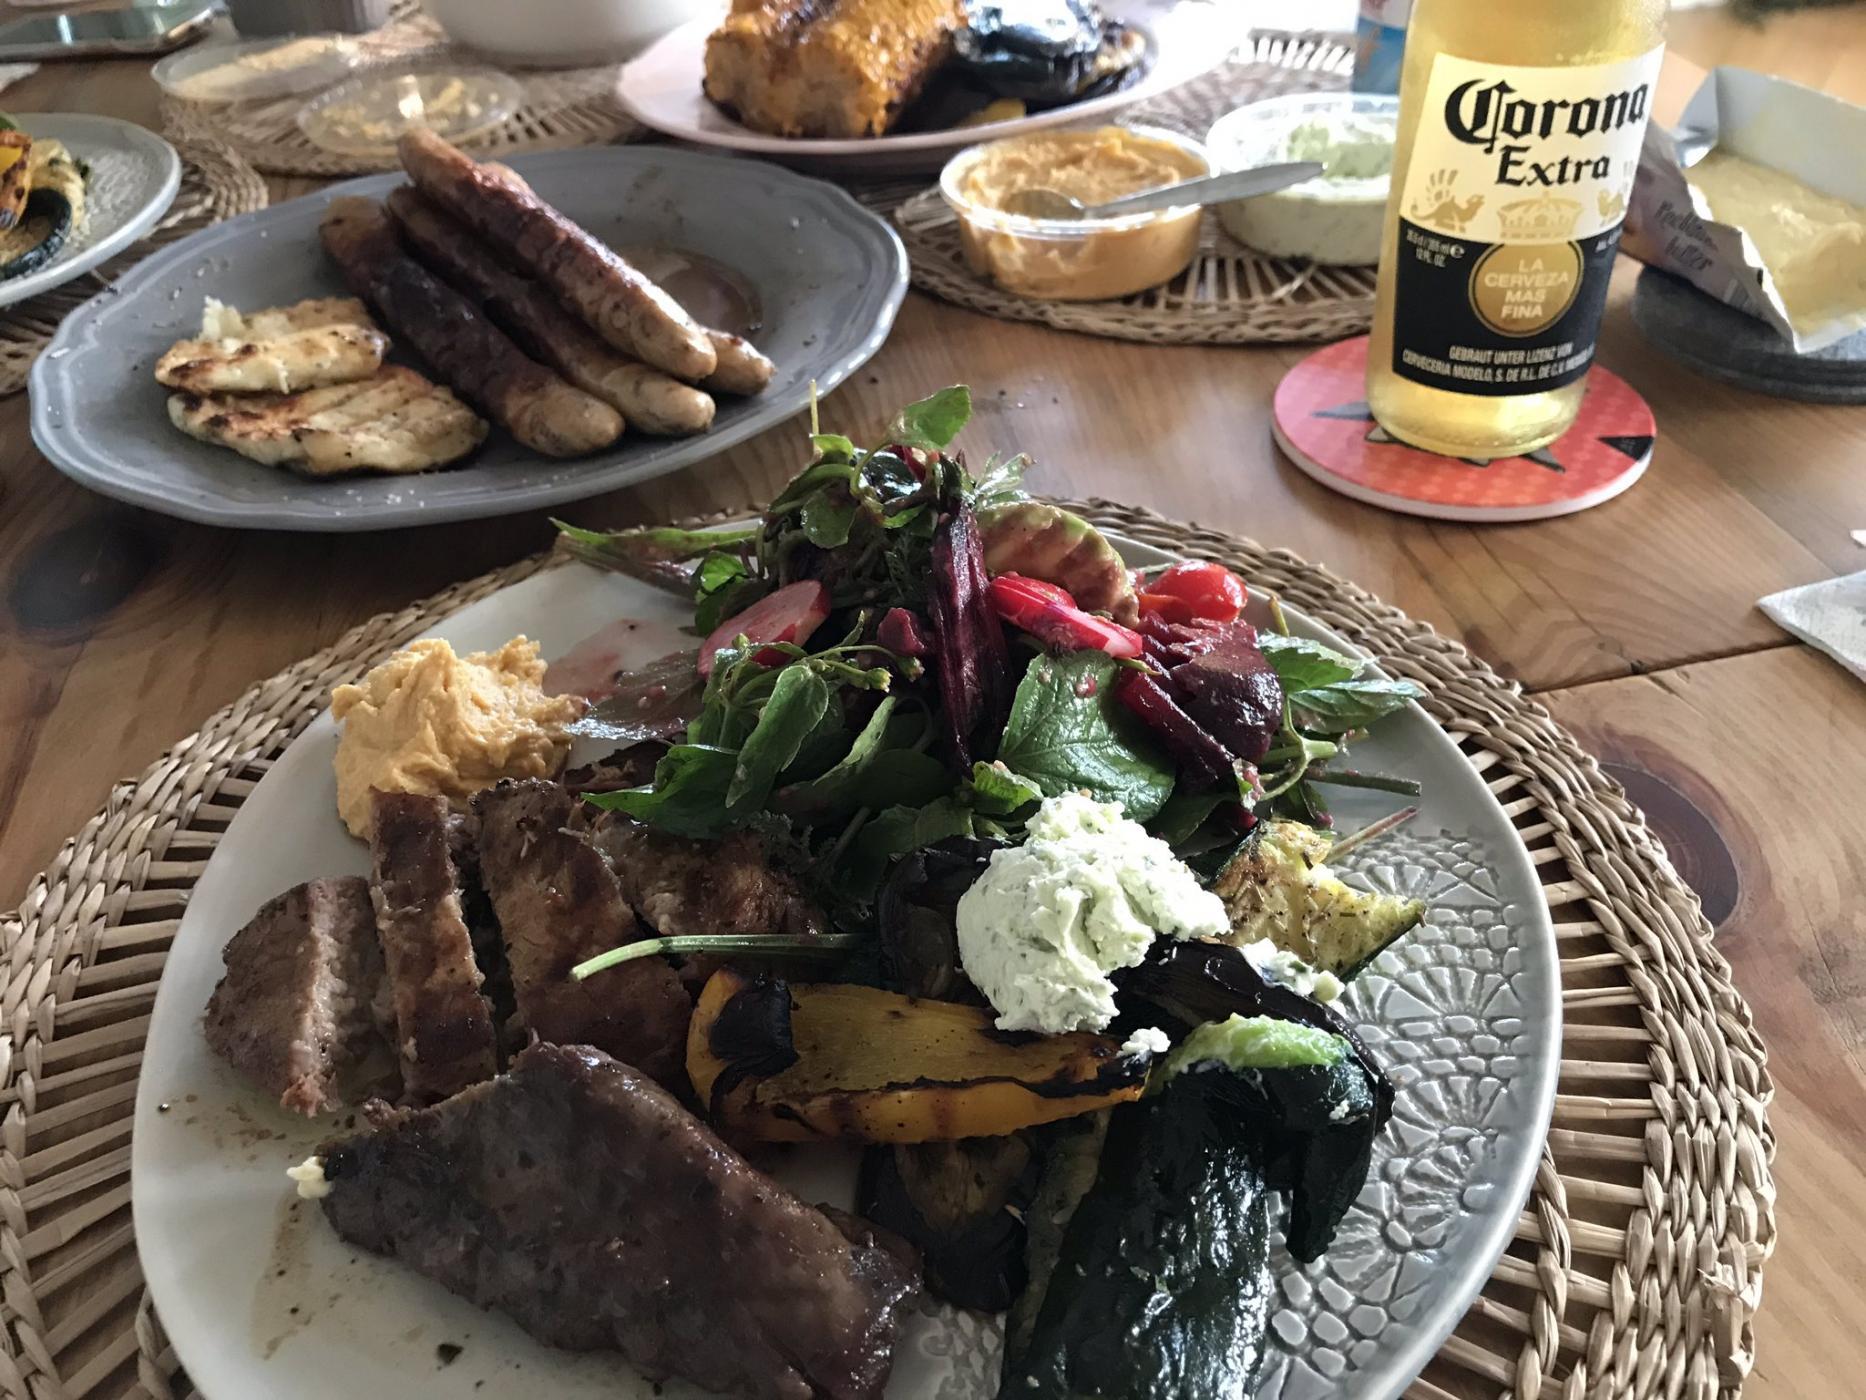 Summertime: mal wieder leckerstes BBQ dinner